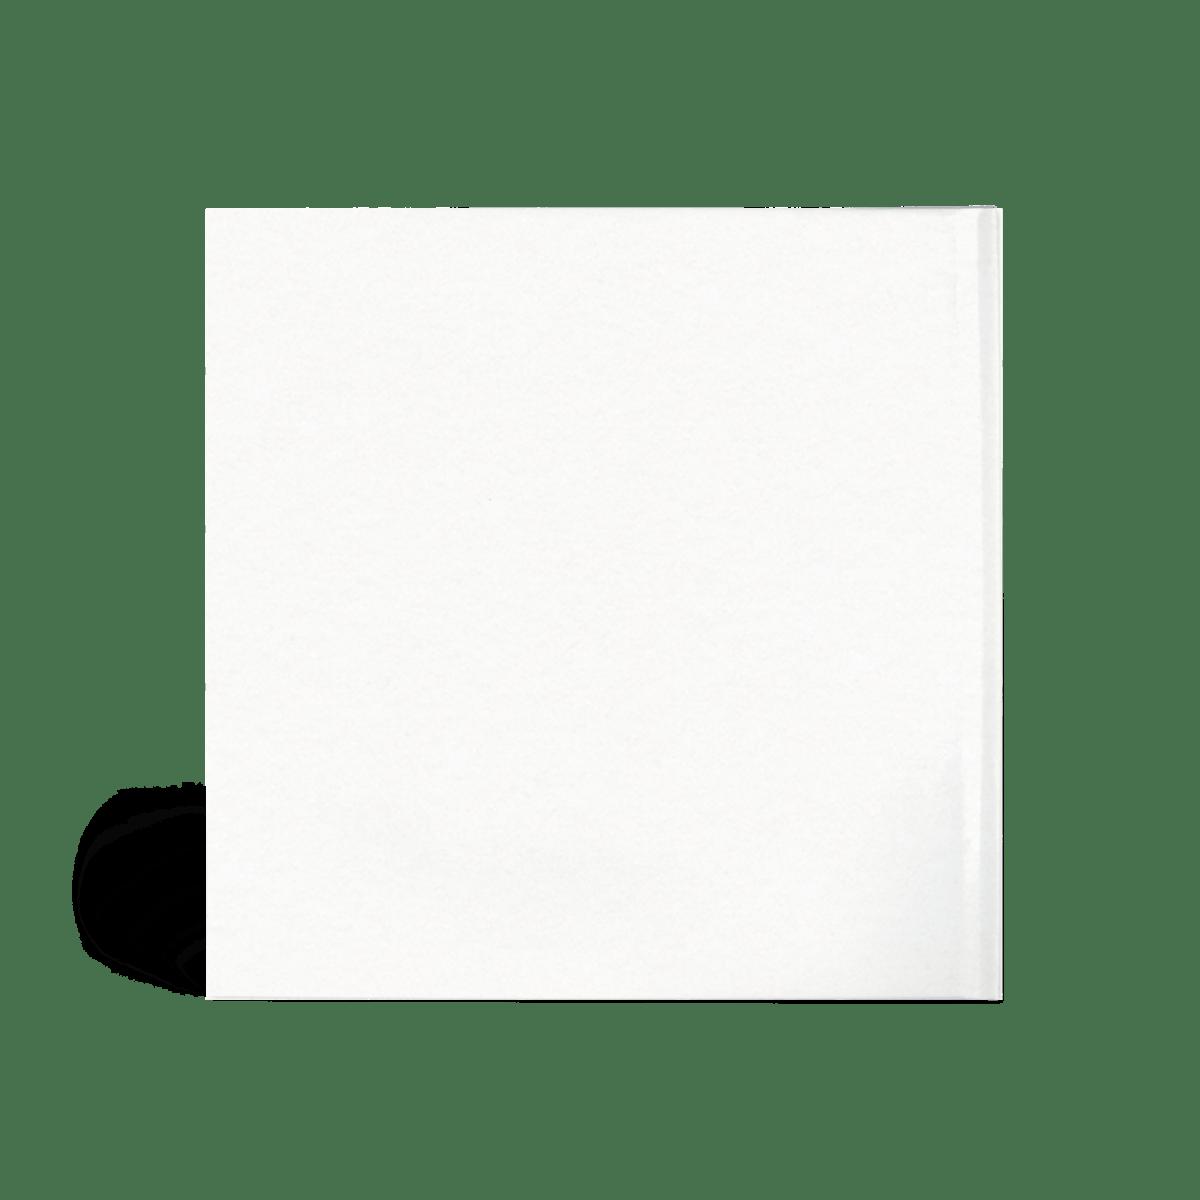 Https%3a%2f%2fwww.papier.com%2fproduct image%2f60473%2f33%2fthe minimalist 14471 back 1545923533.png?ixlib=rb 1.1